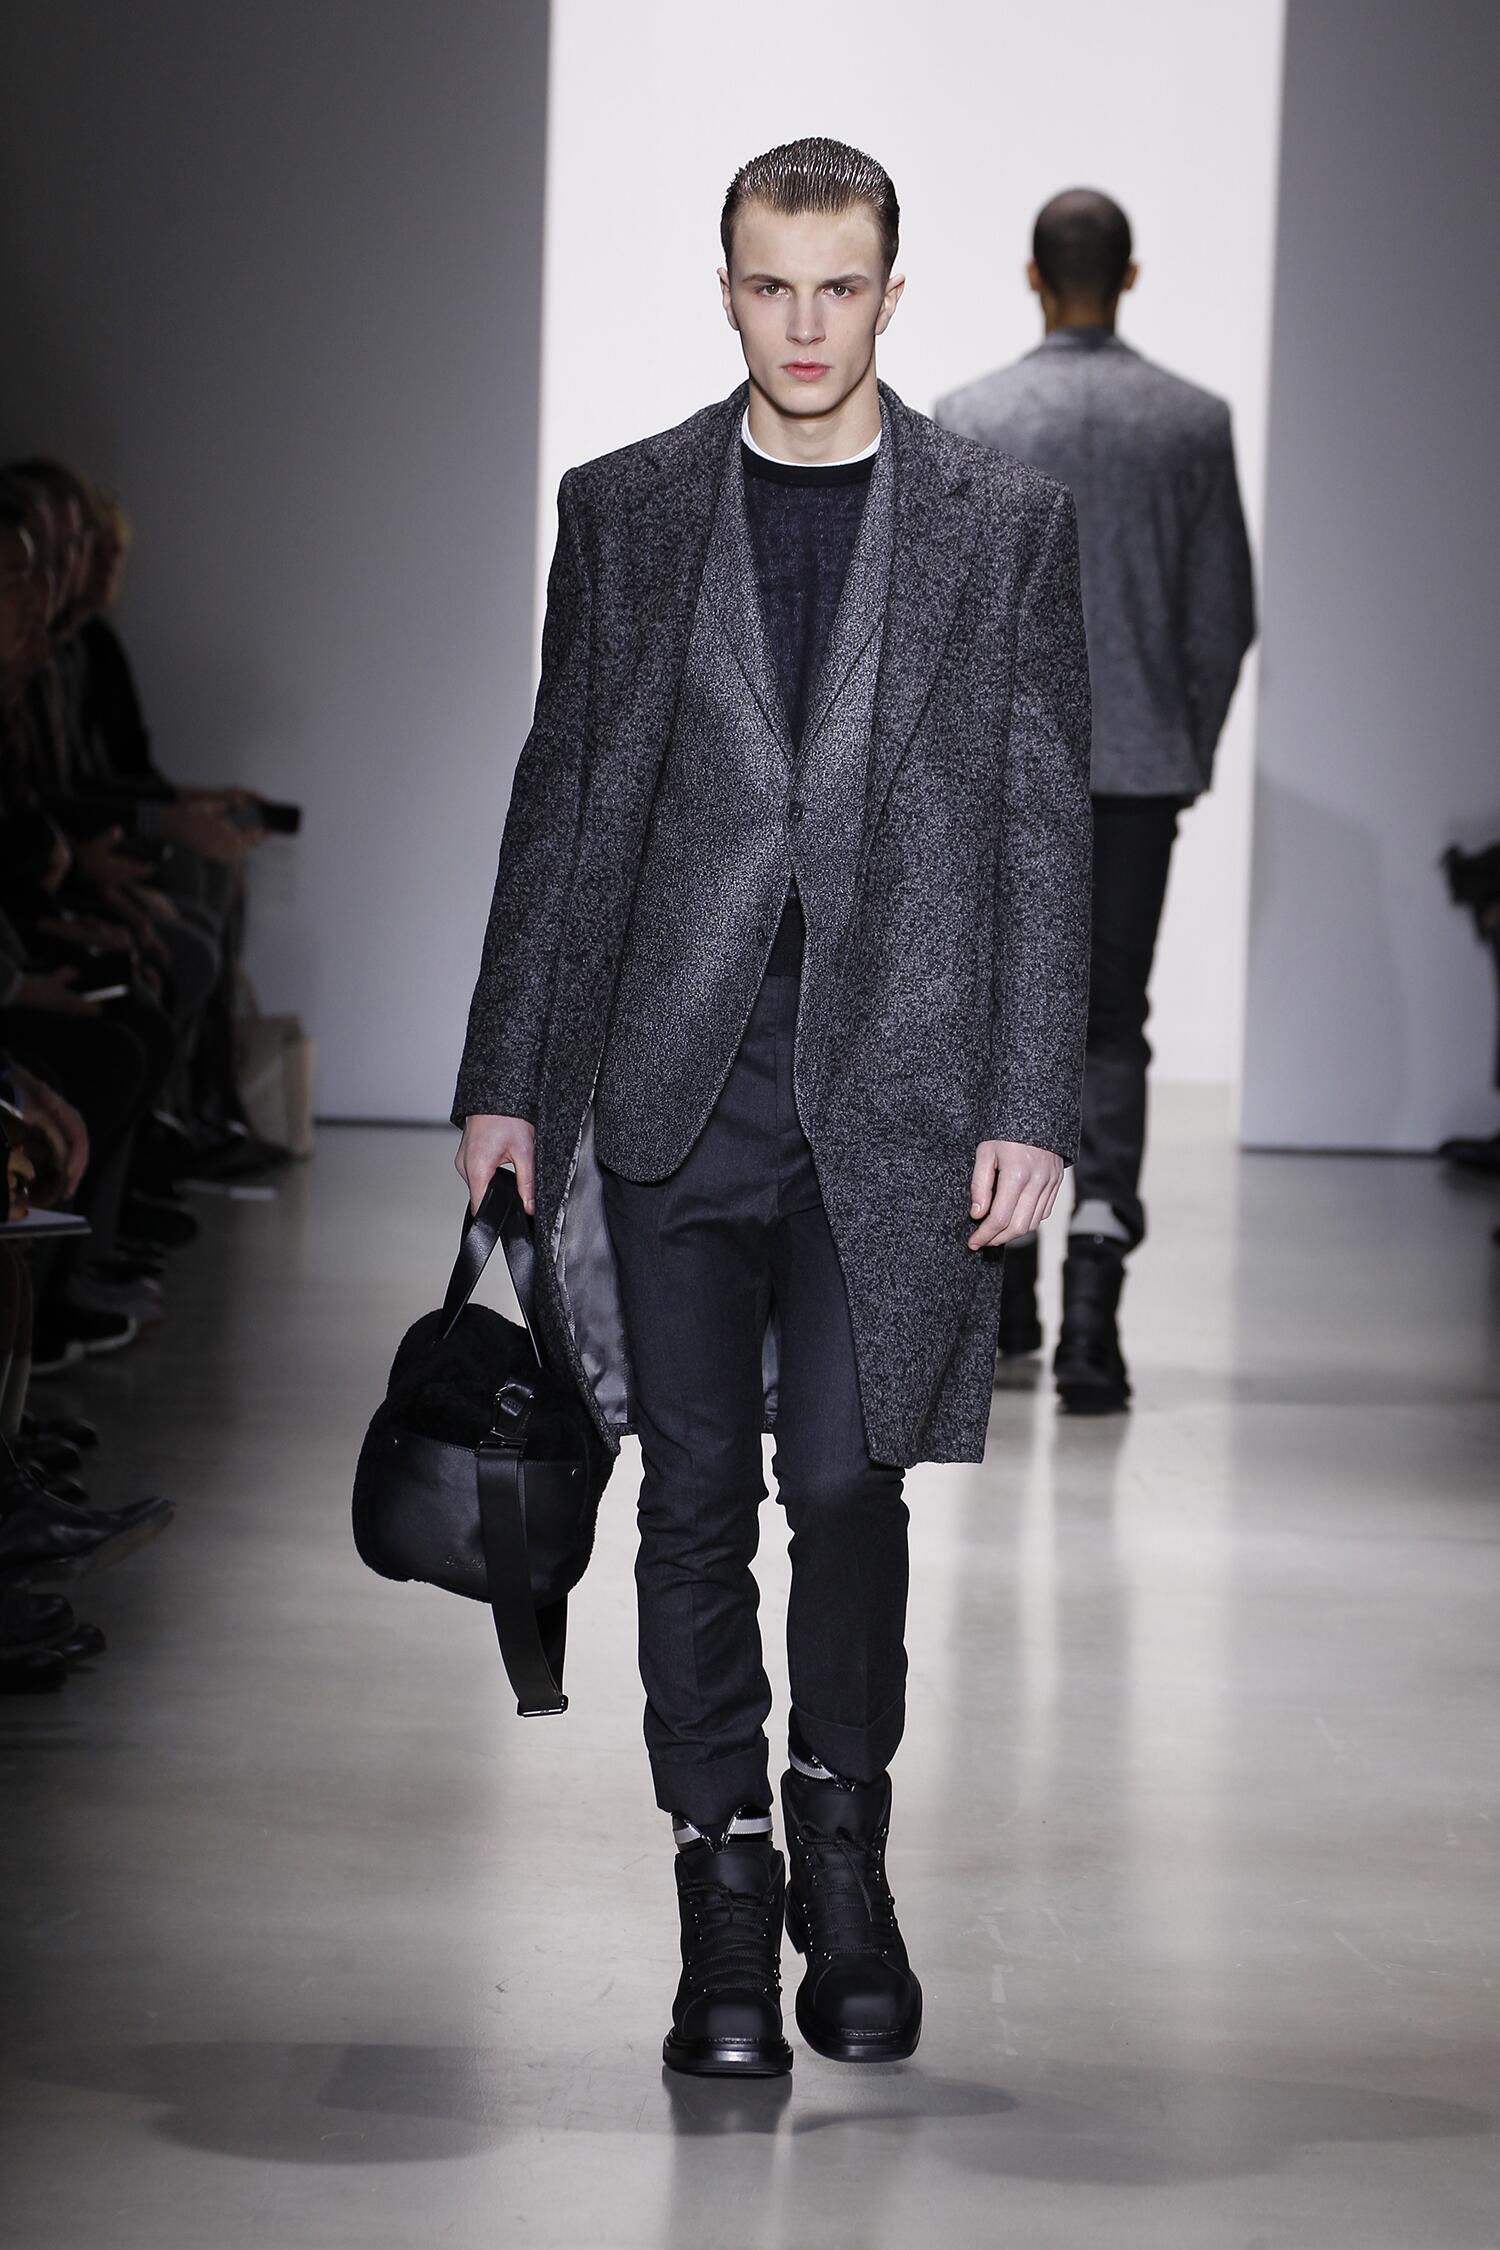 Fashion Model Calvin Klein Collection Catwalk